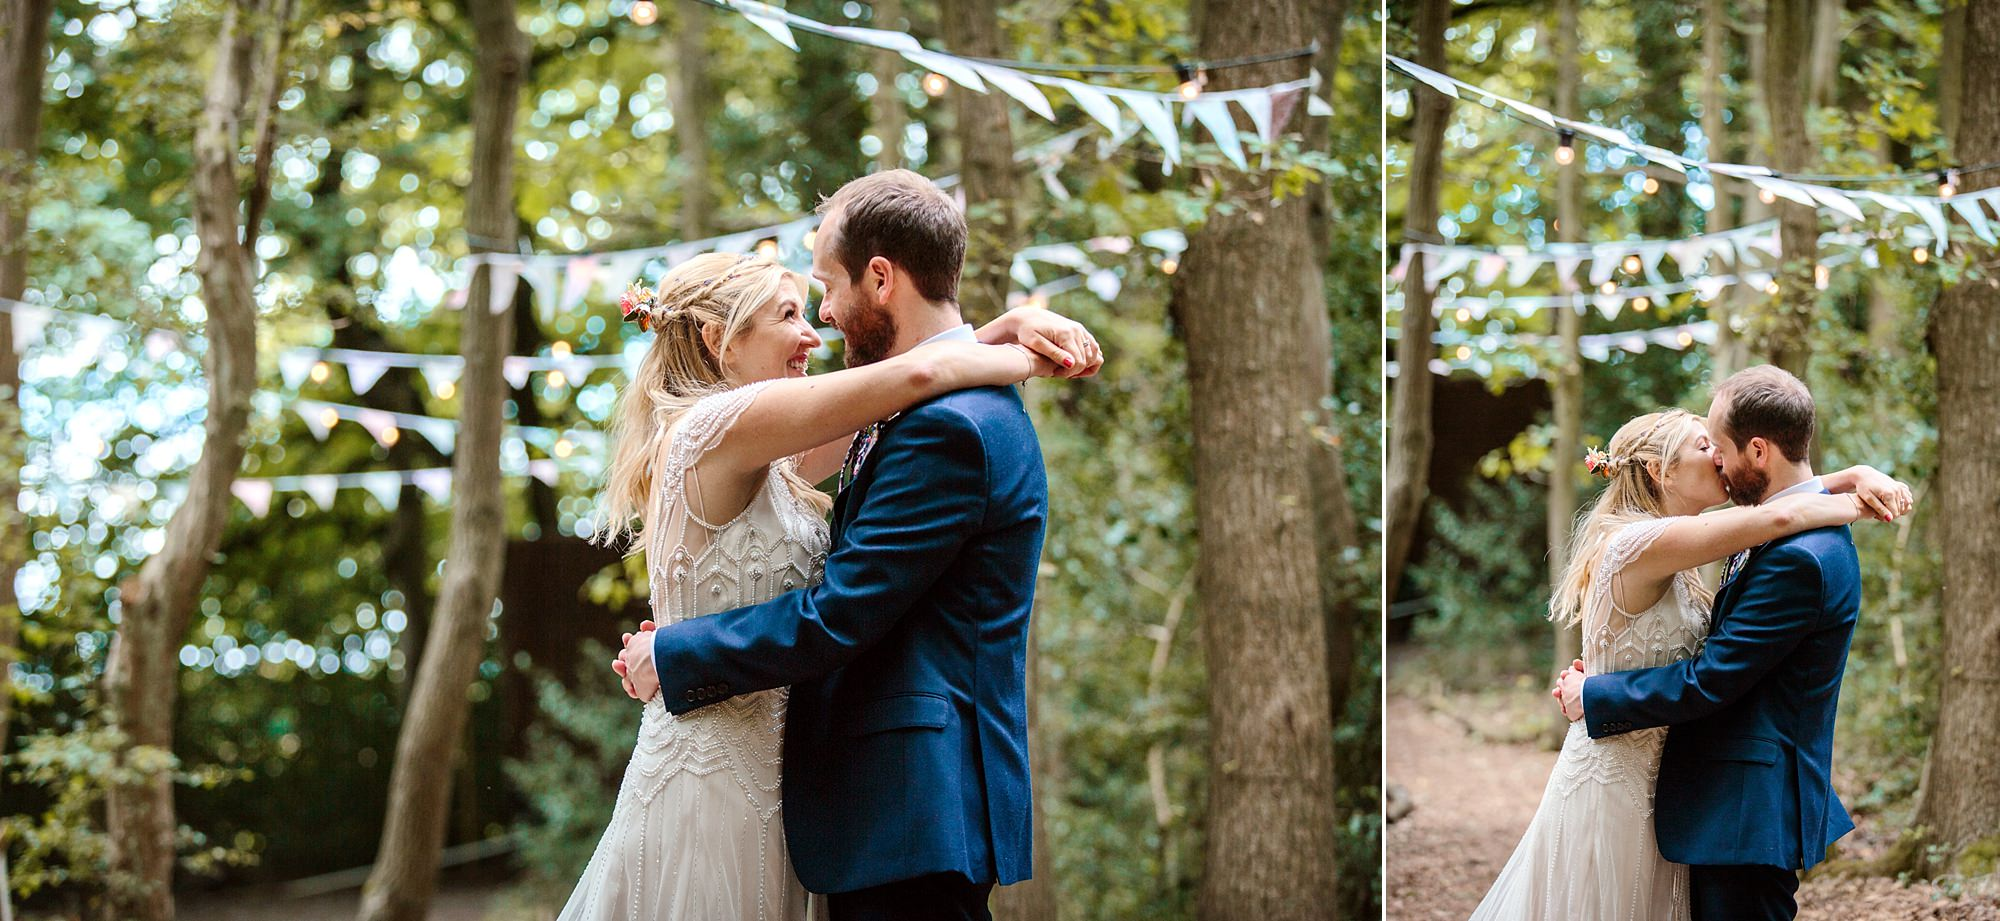 Woodland Weddings Tring bride and groom in woodland